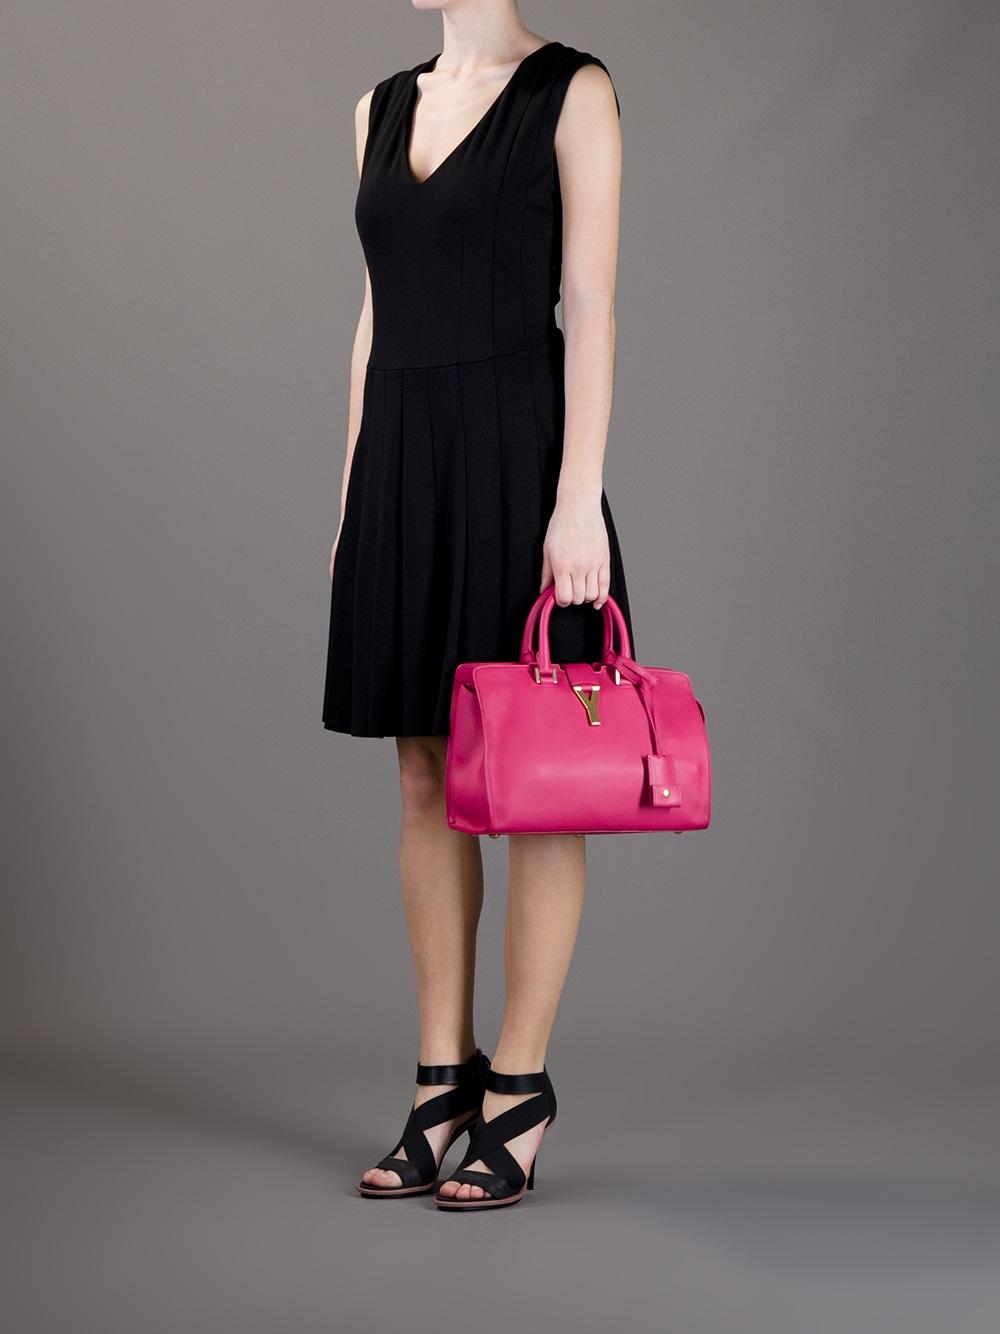 Saint laurent \u0026#39;classic Cabas Y\u0026#39; Small Bag in Pink (pink \u0026amp; purple ...